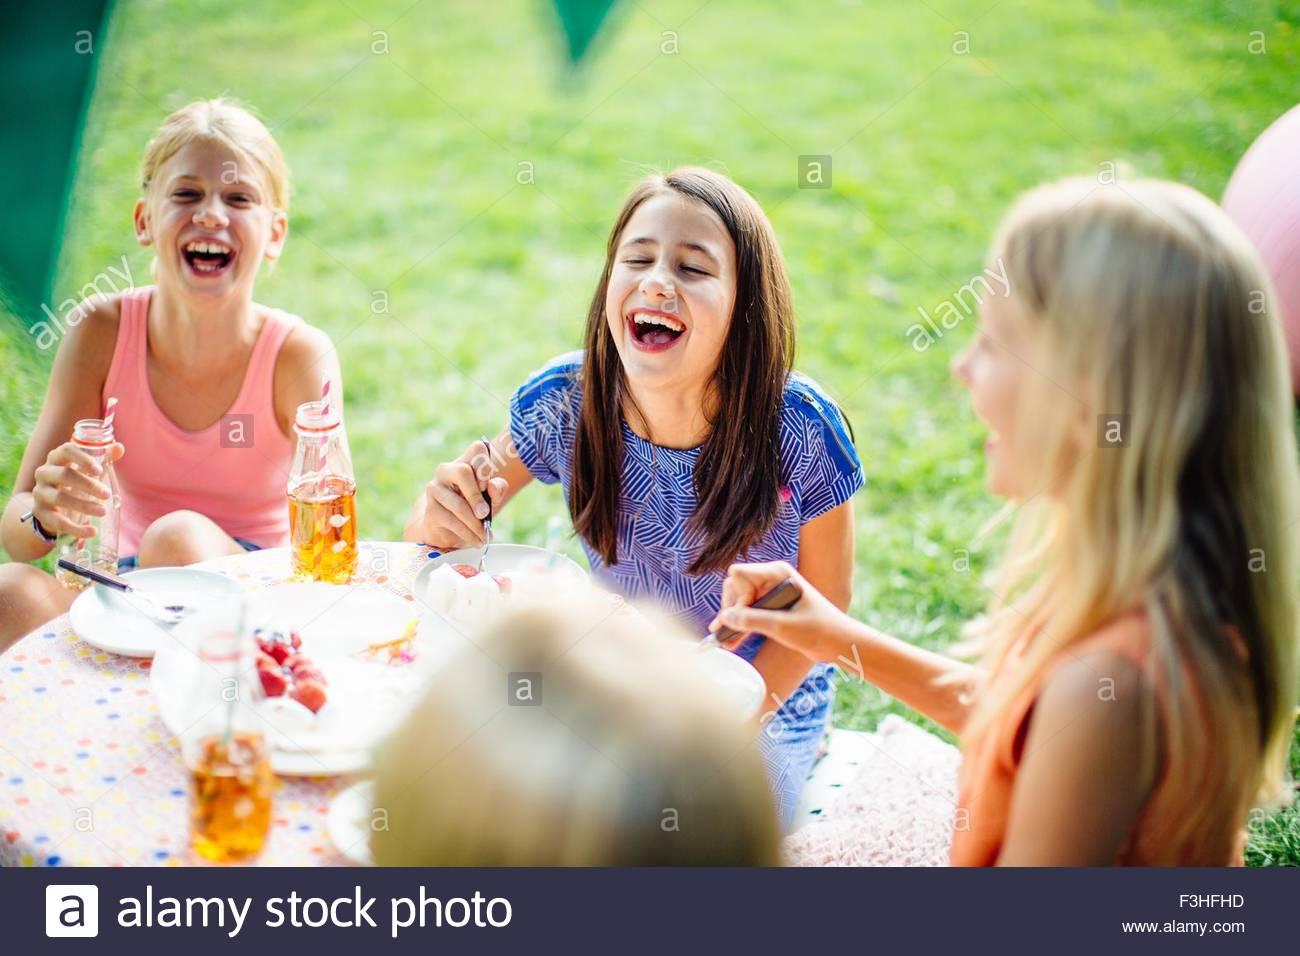 Girls having fun at summer garden party - Stock Image